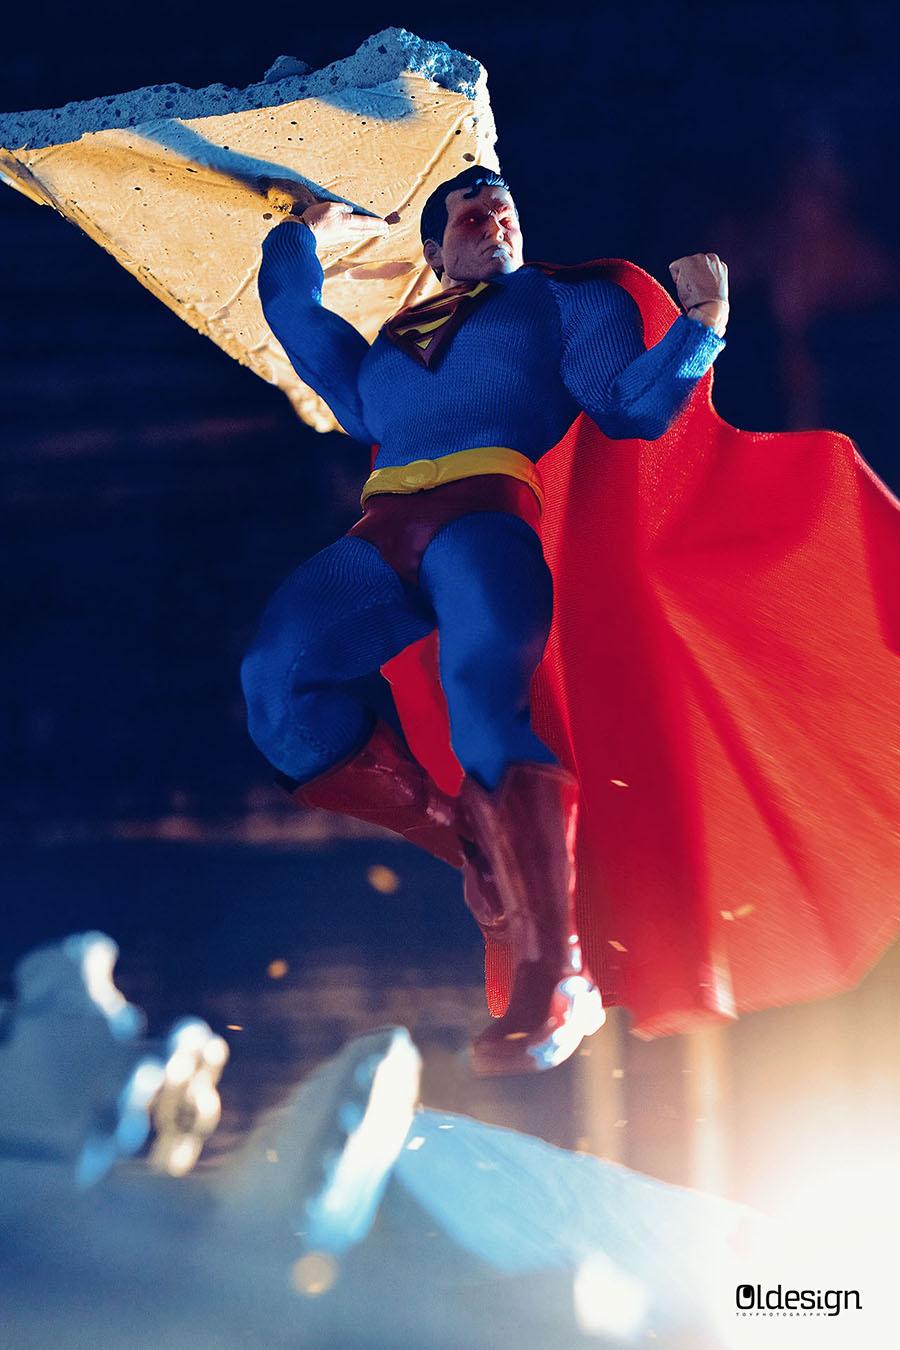 oldesign_superman_02